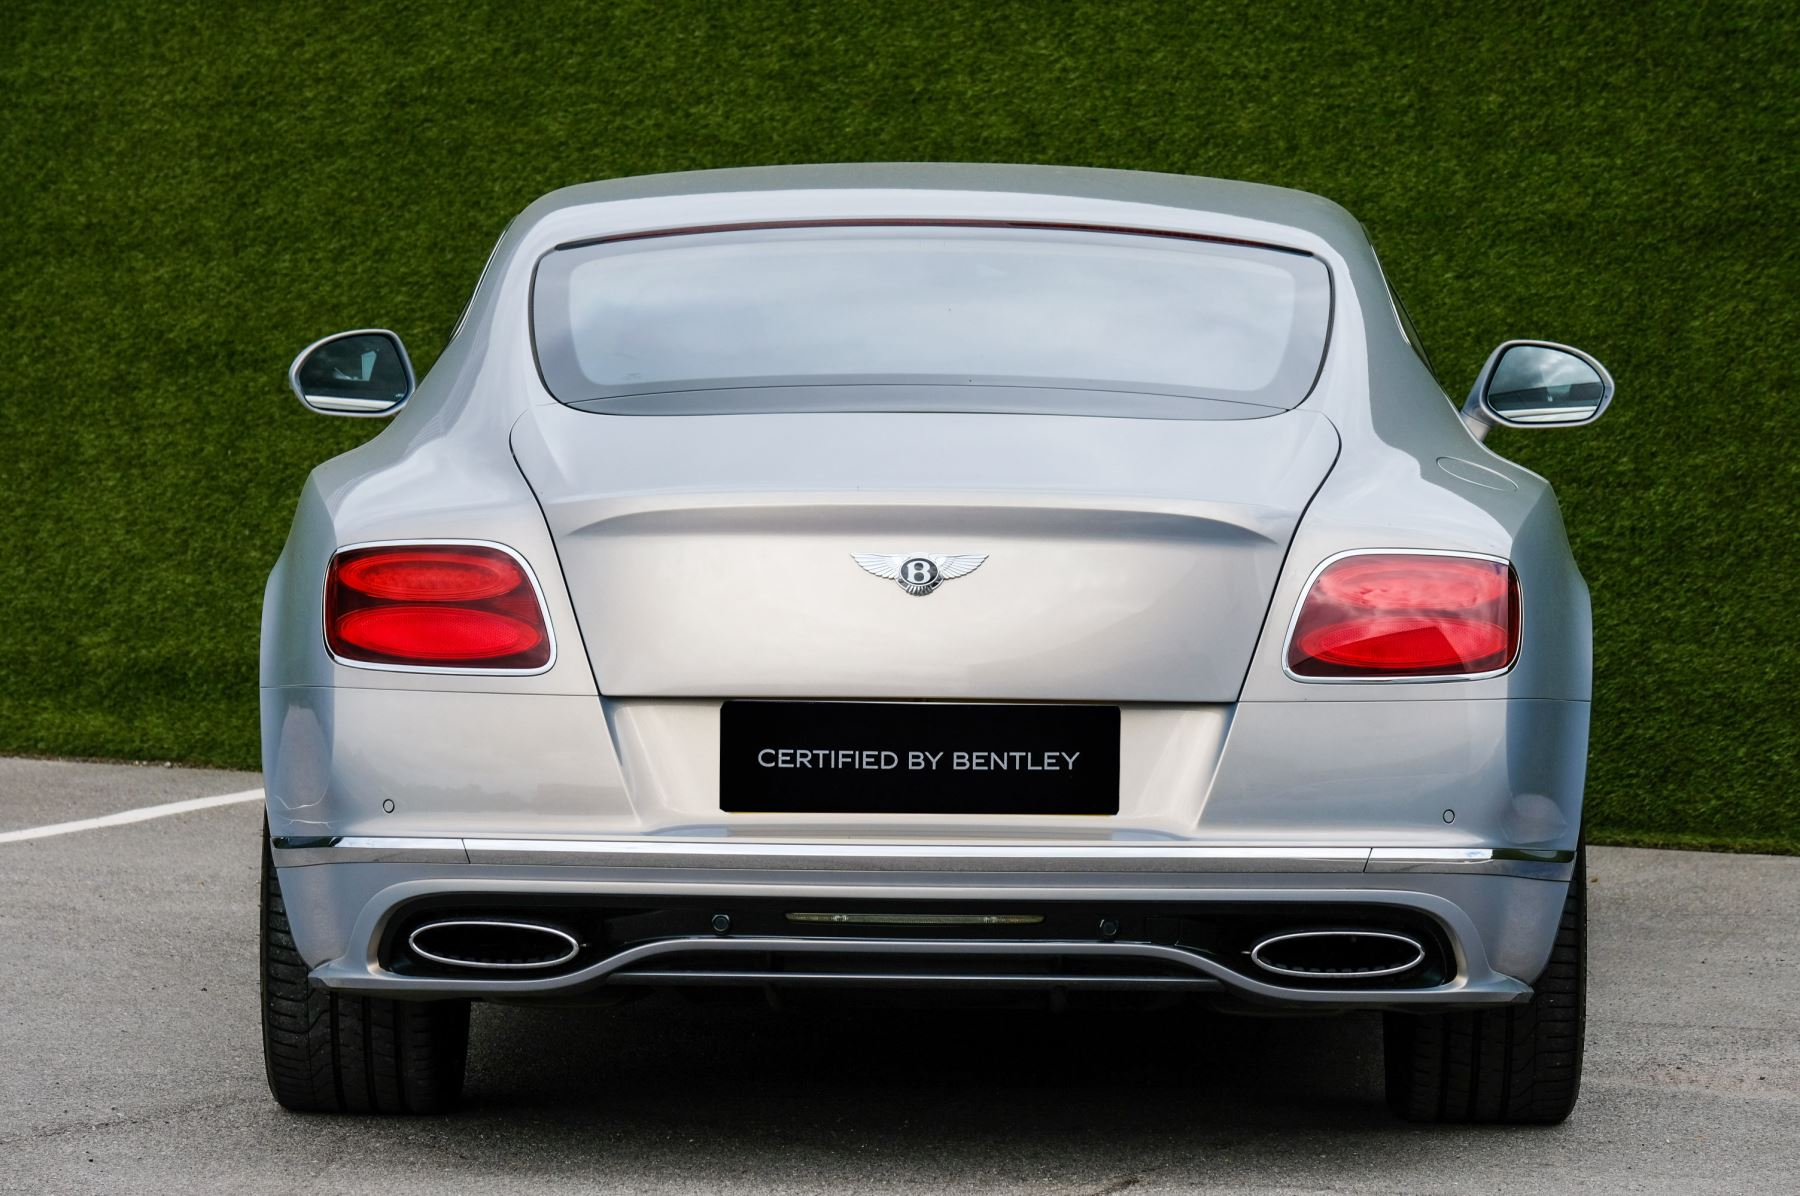 Bentley Continental GT 6.0 W12 [635] Speed - Premier Specification - Carbon Fibre Fascia Panels image 4